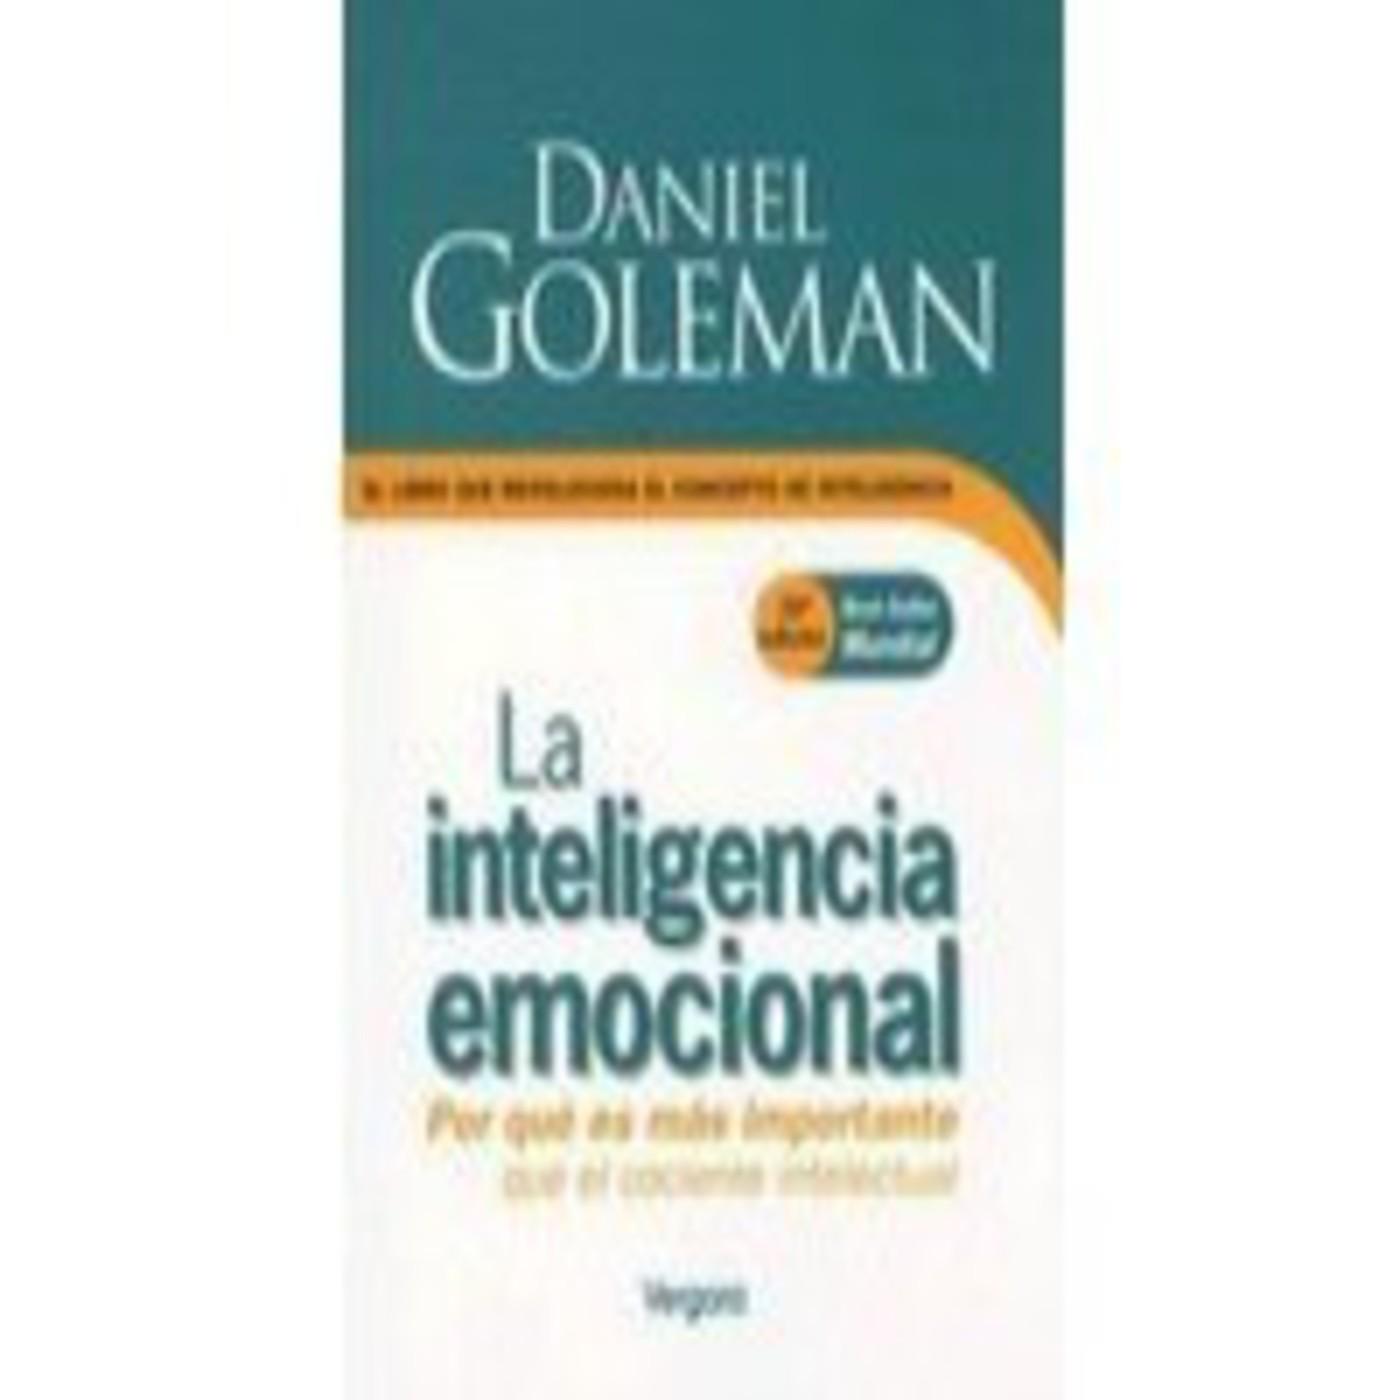 35..INTELIGENCIA EMOCIONAL, Daniel Goleman